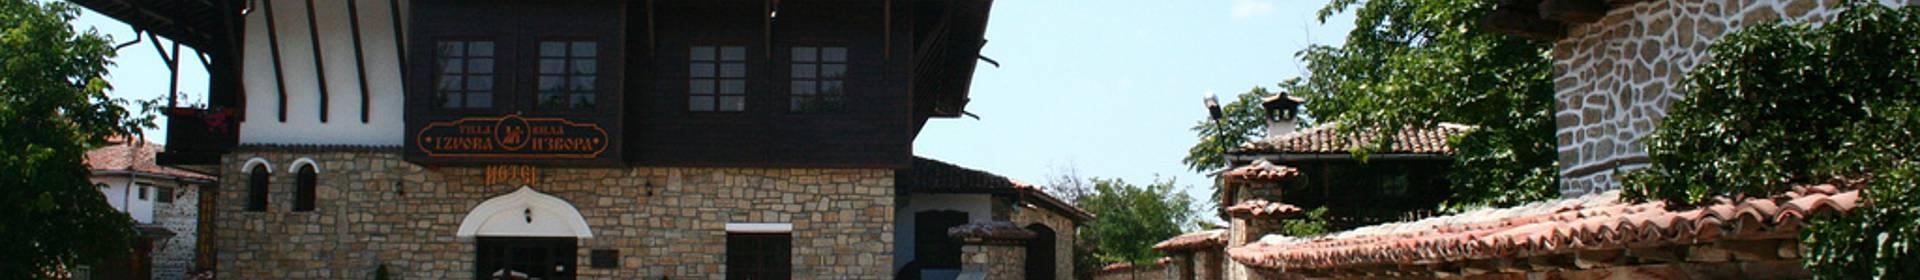 Arbanasi